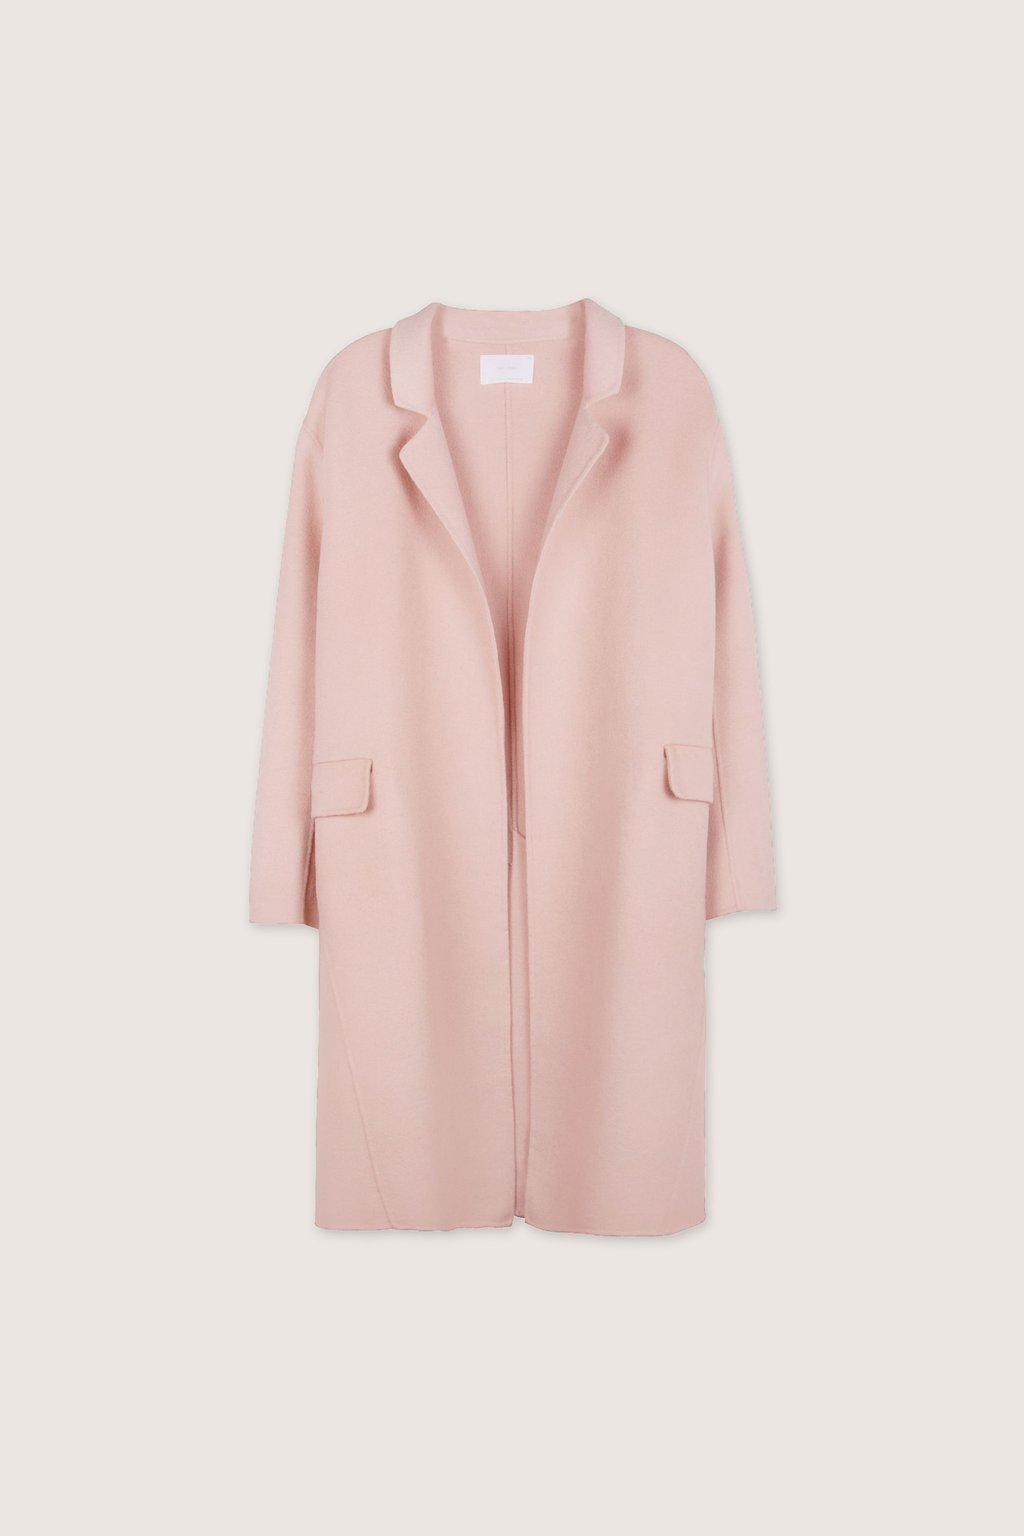 Handmade Coat 1580 Pink 7